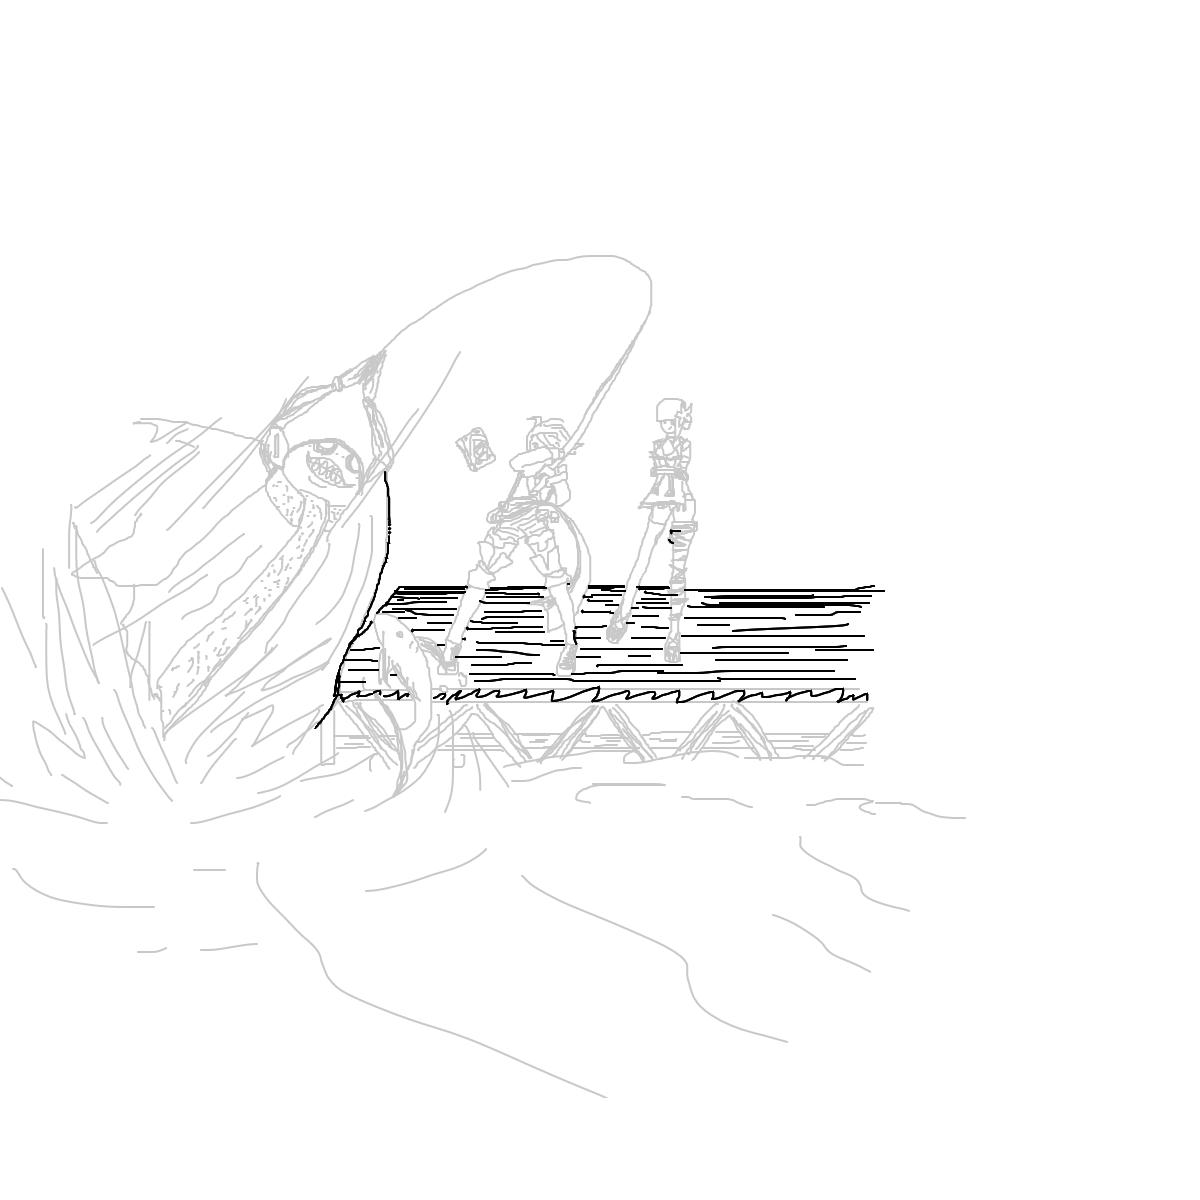 BAAAM drawing#24145 lat:78.4175643920898400lng: -4.4388680458068850